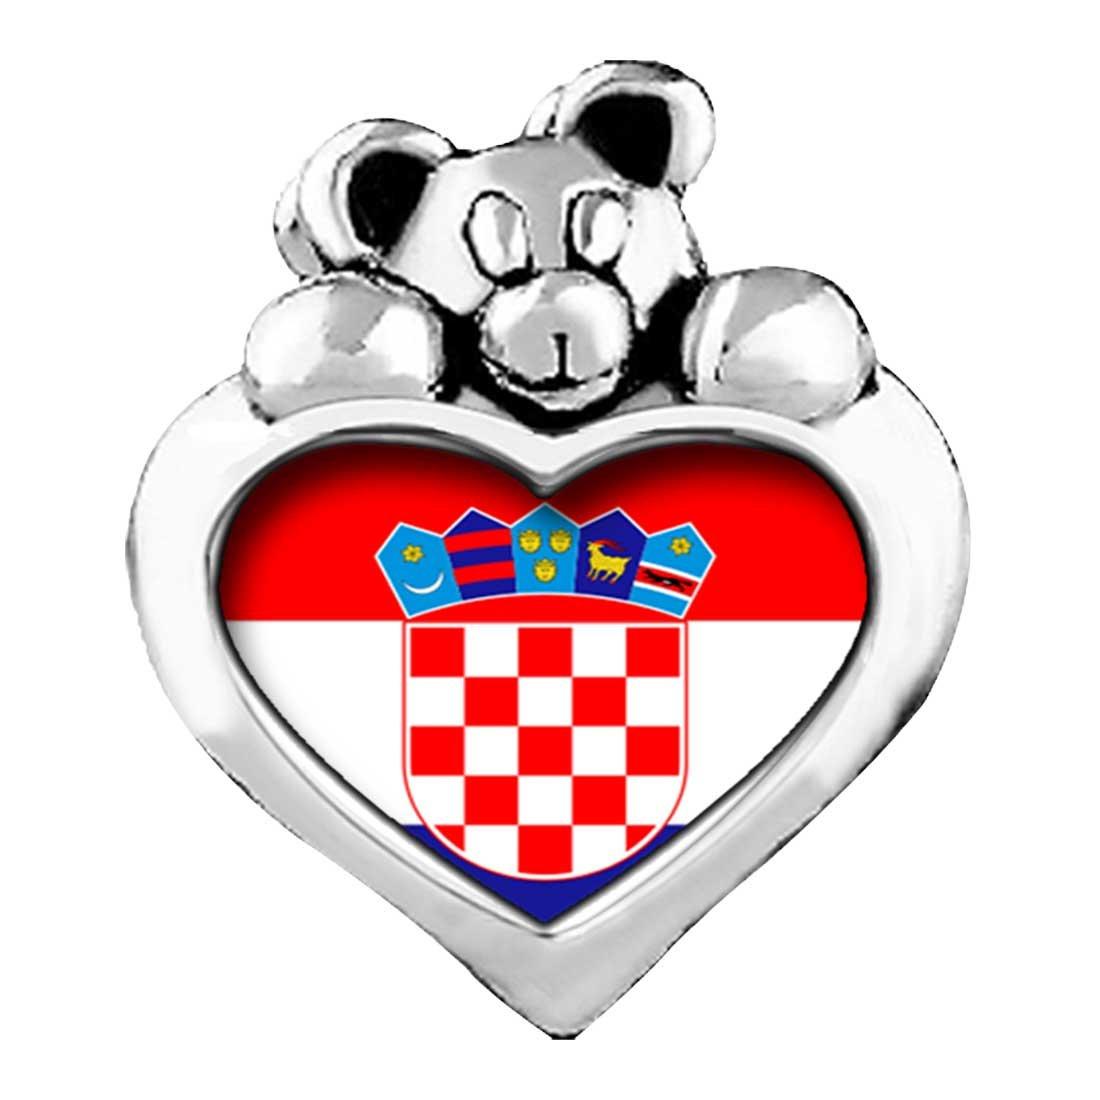 Croatia flag Purple Amethyst Crystal February Birthstone I Love You Heart Care Bear Charm Beads Bracelets GiftJewelryShop